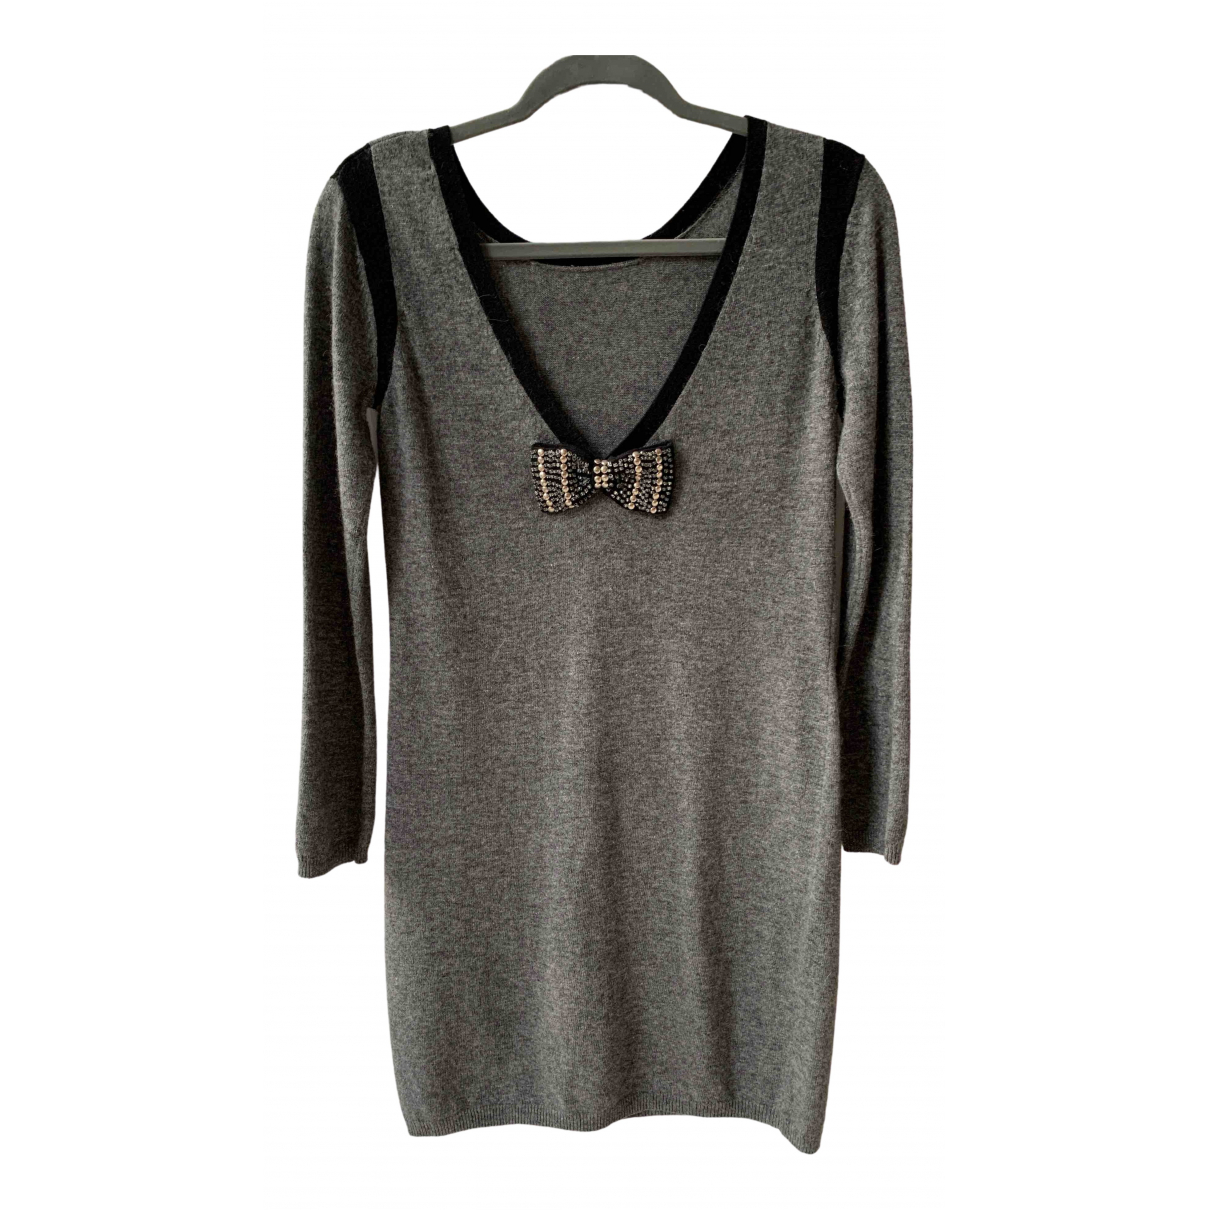 Sandro \N Grey Cashmere dress for Women S International